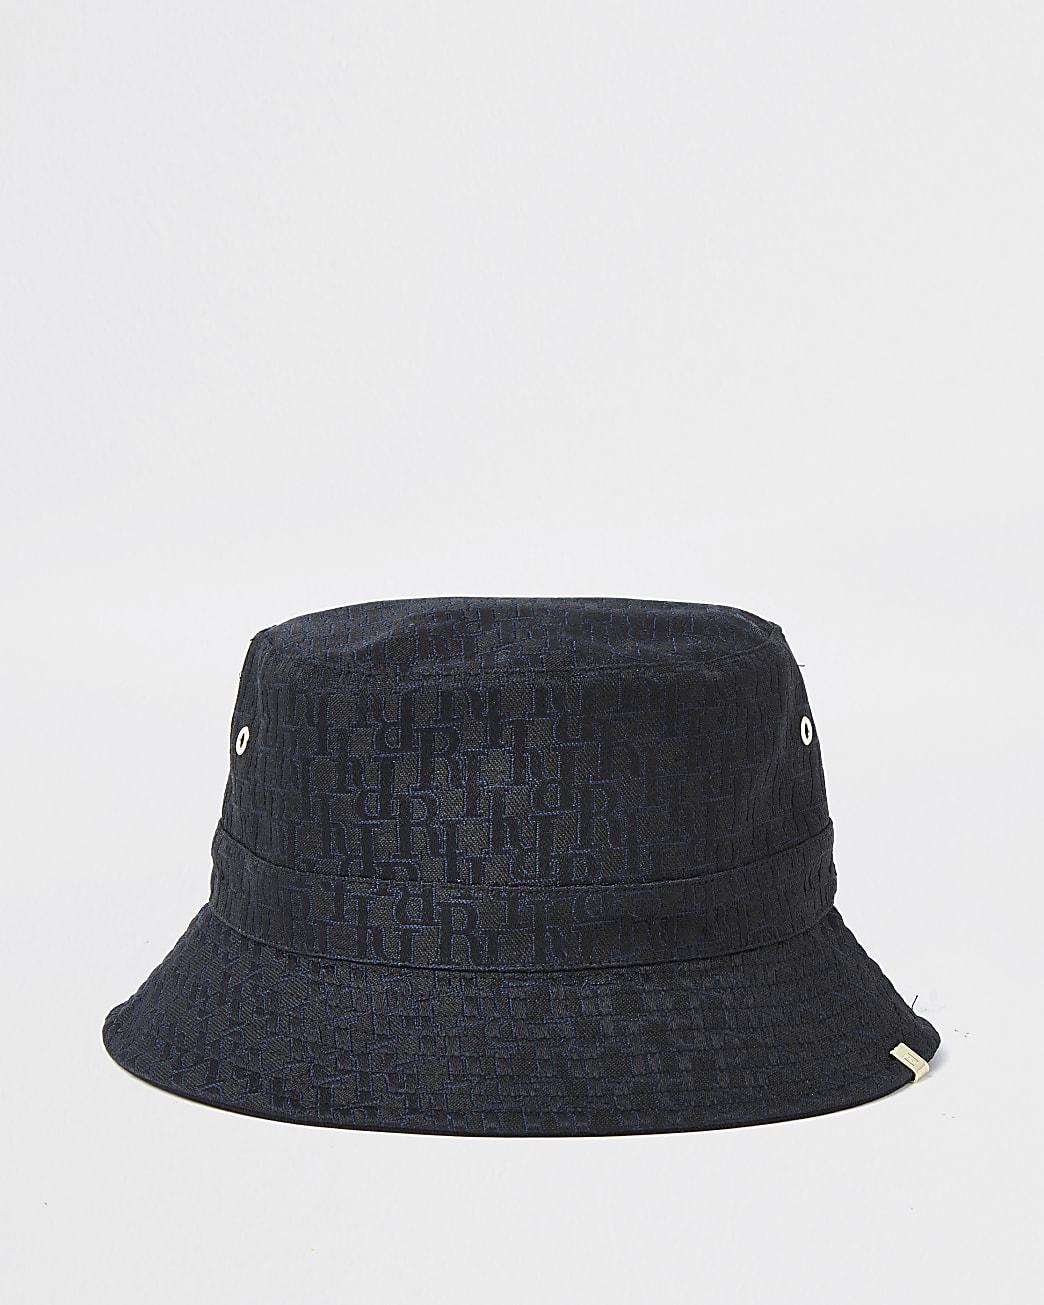 Black 'RI' monogram jacquard bucket hat